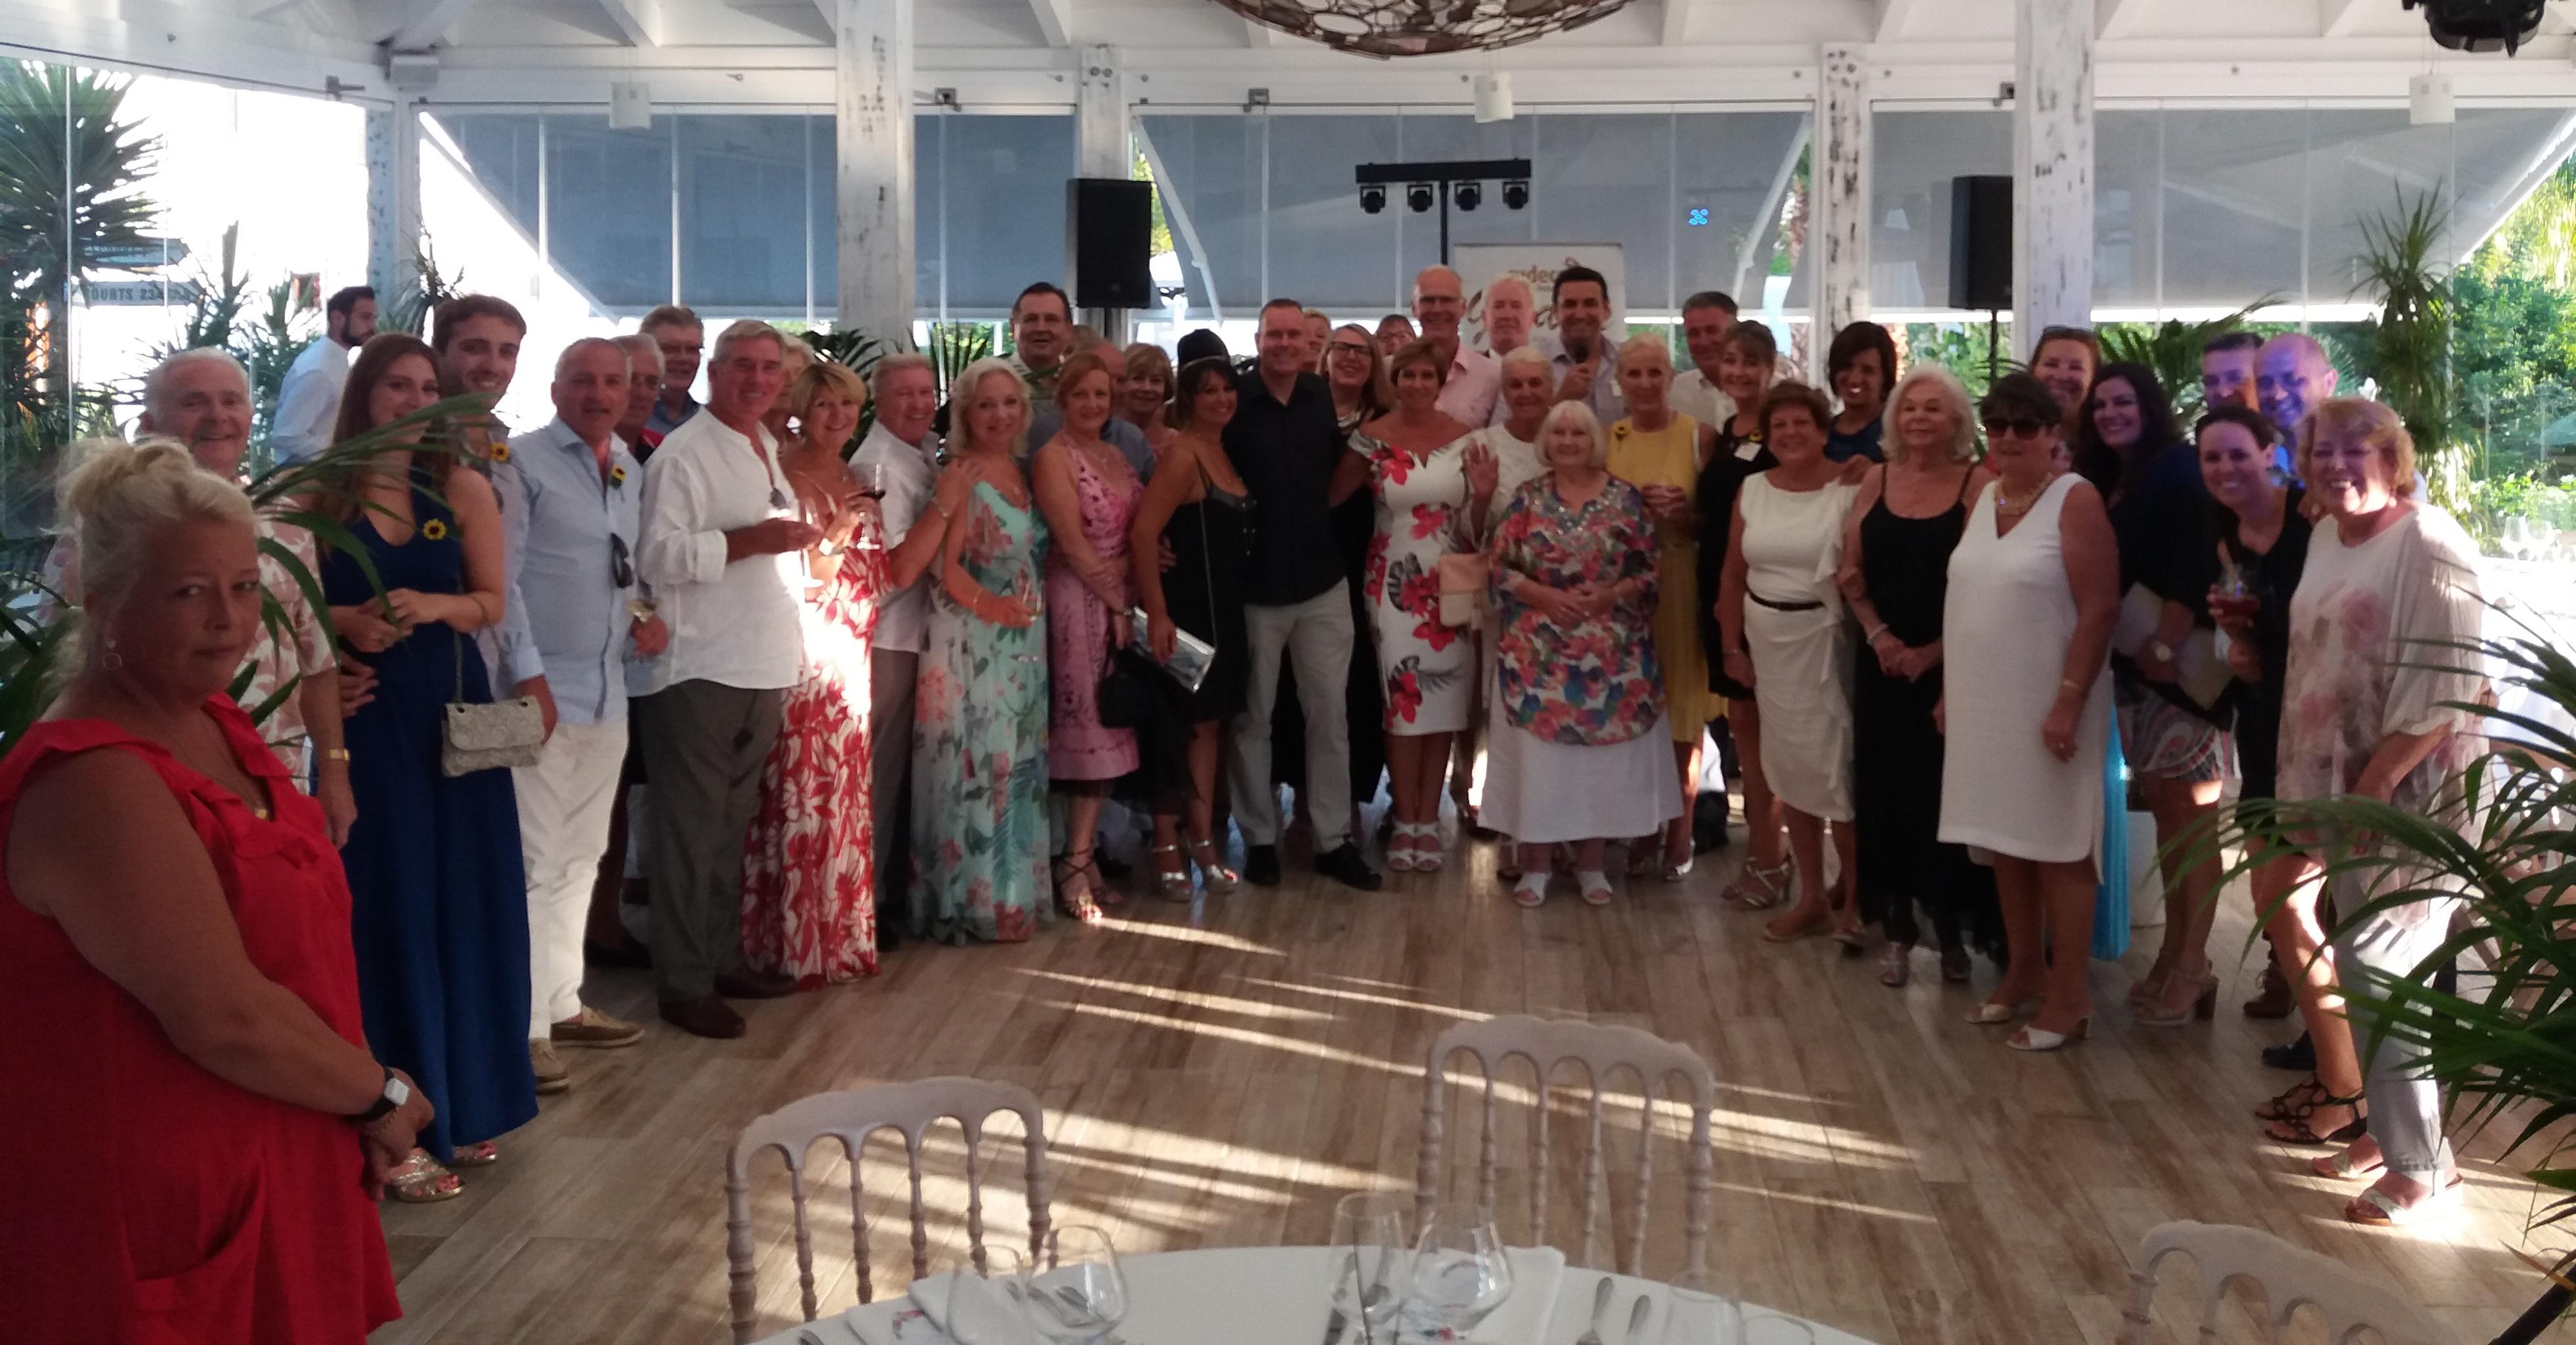 Grand Annual Moonlight Gala at Lew Hoad Tennis Club in Mijas The